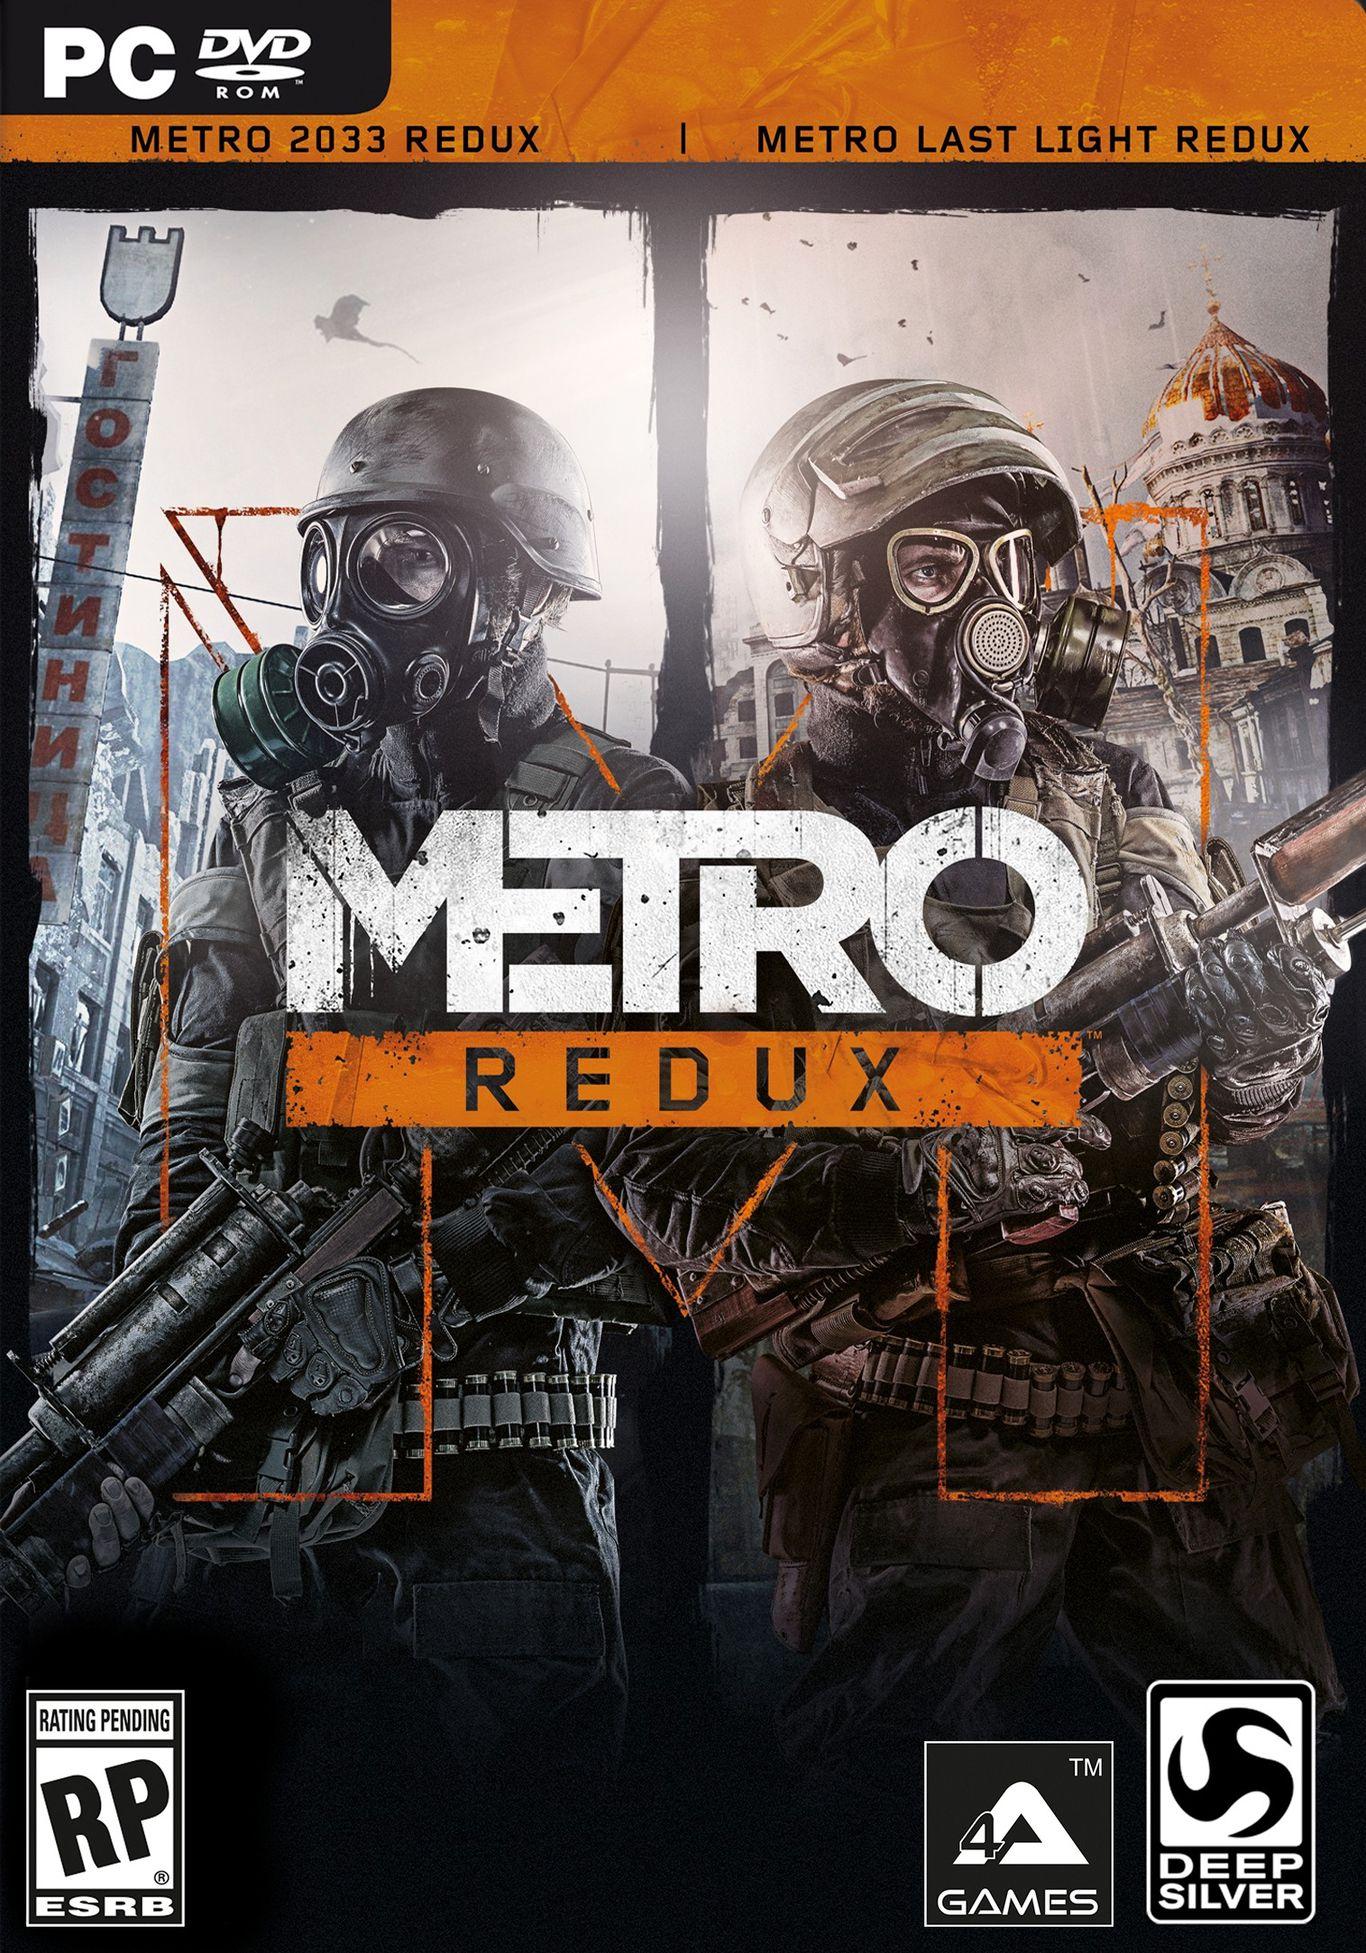 Metro Redux Duology – R.G Mechanics (2014)